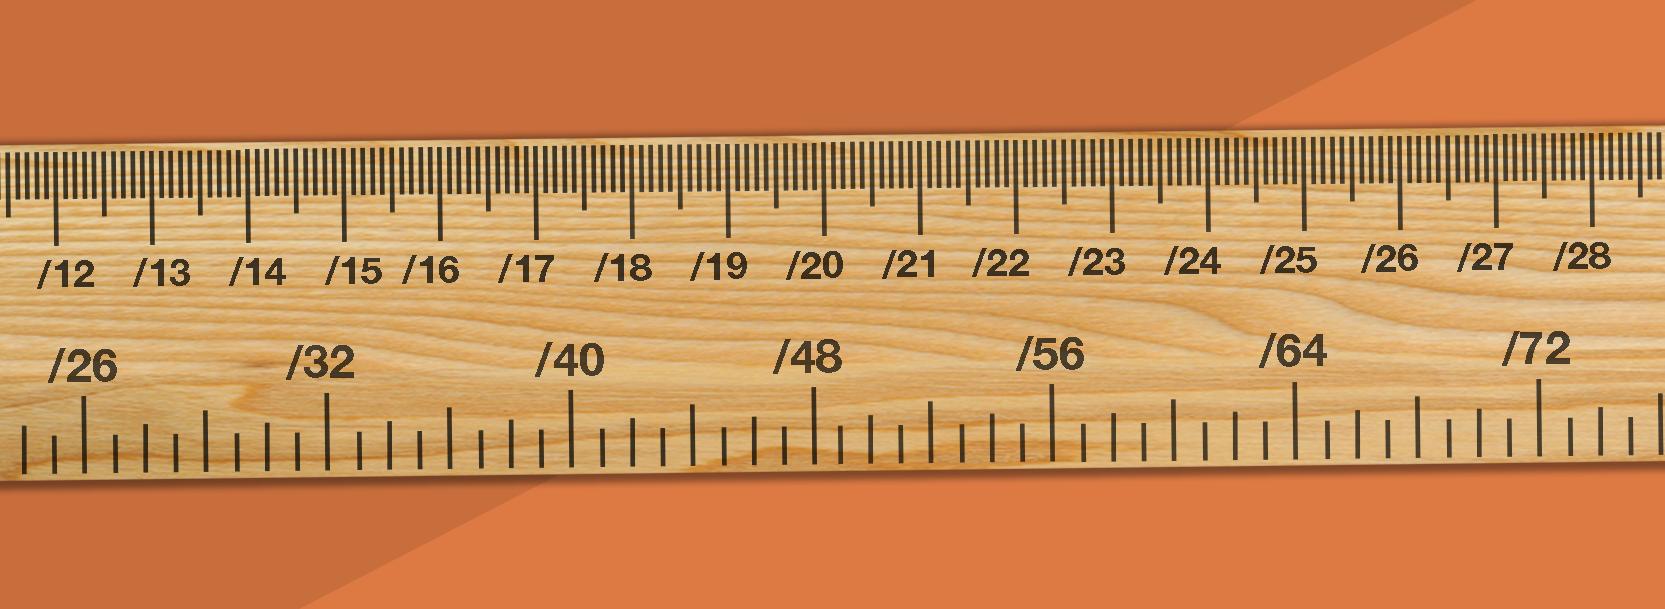 Measuring the IPv6 network periphery